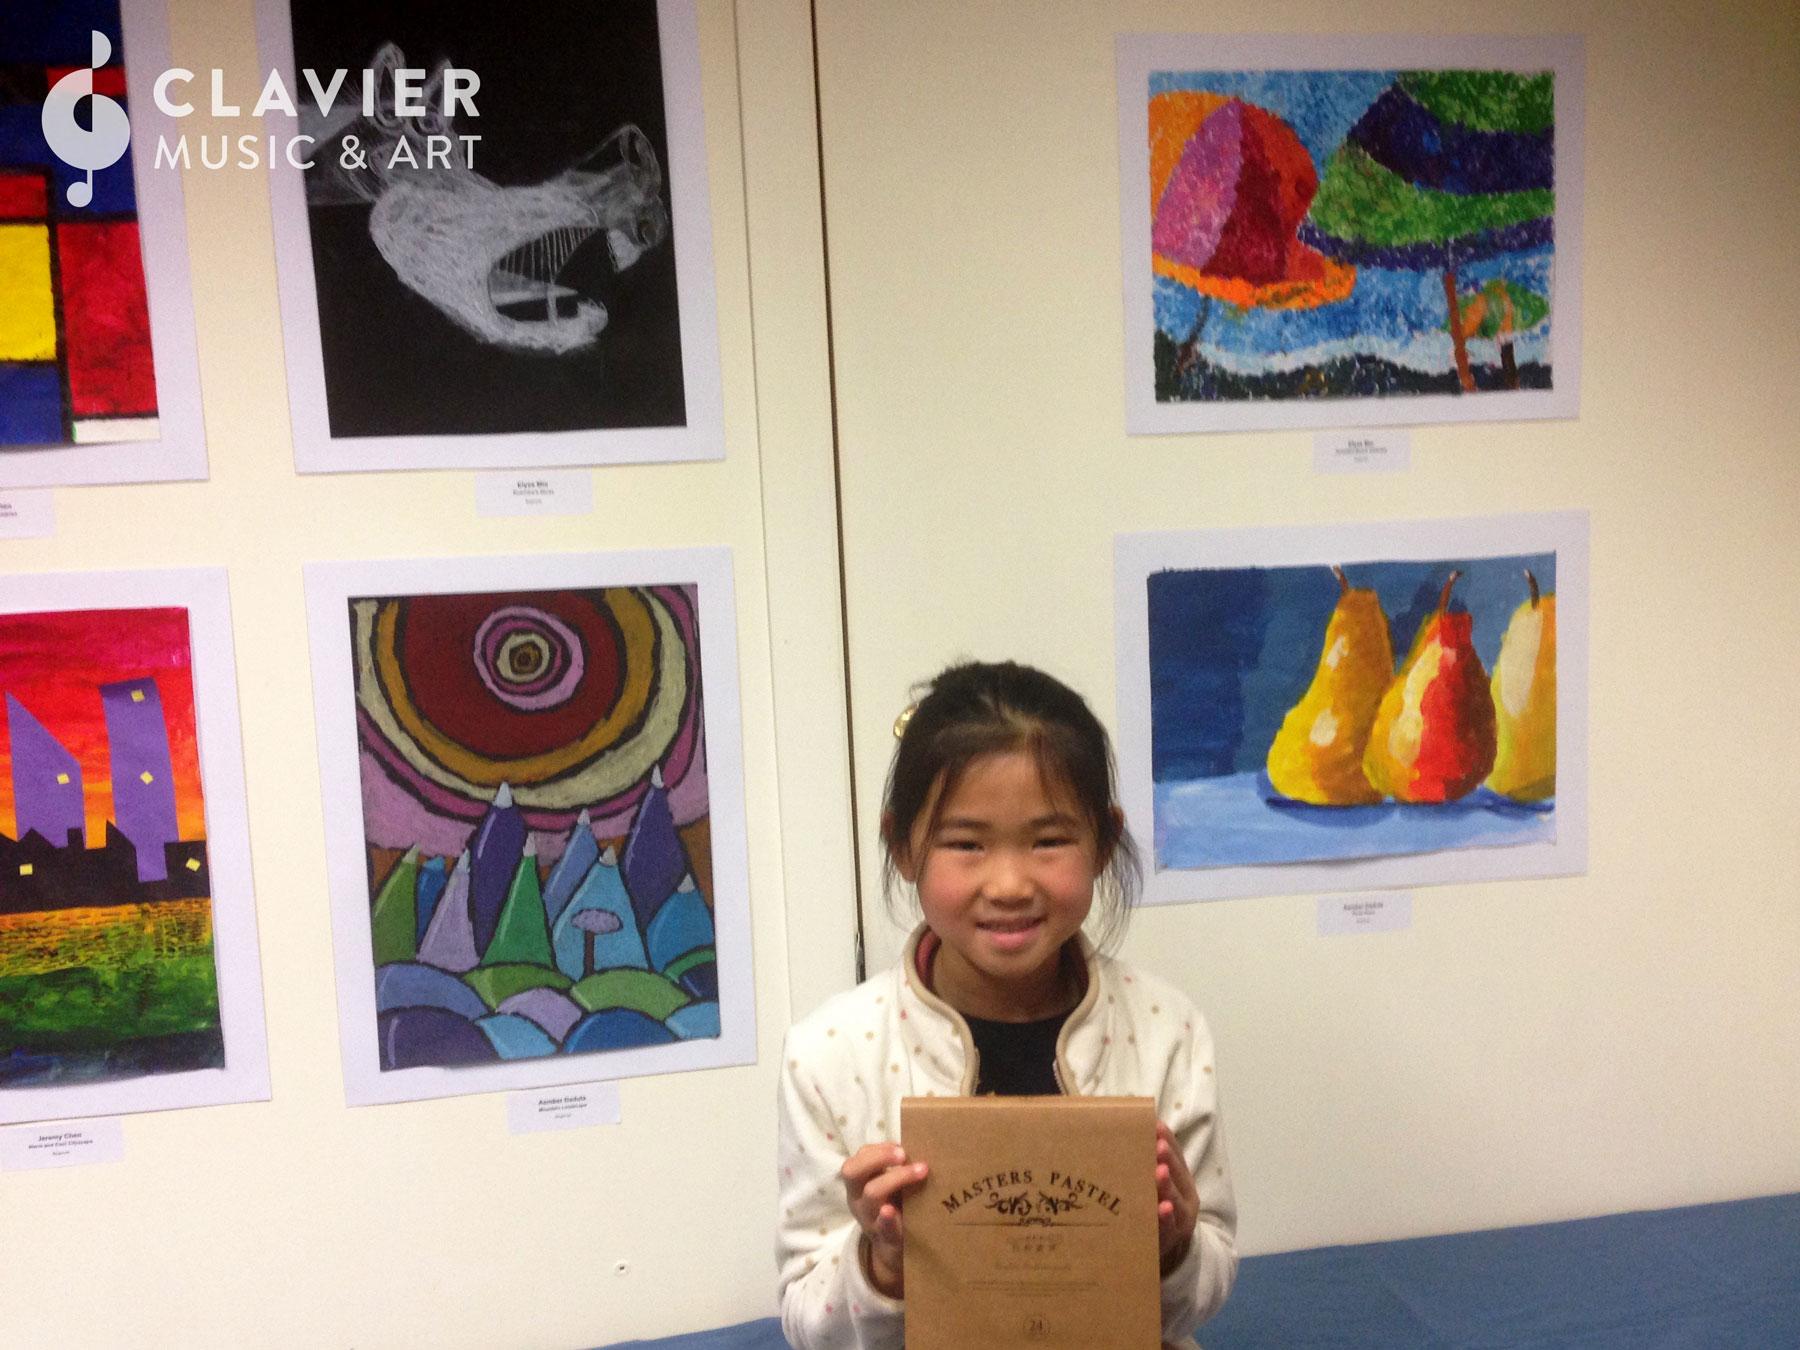 Clavier Music & Art, Art Exhibition, Art Class, Art Lesson, Hurstville